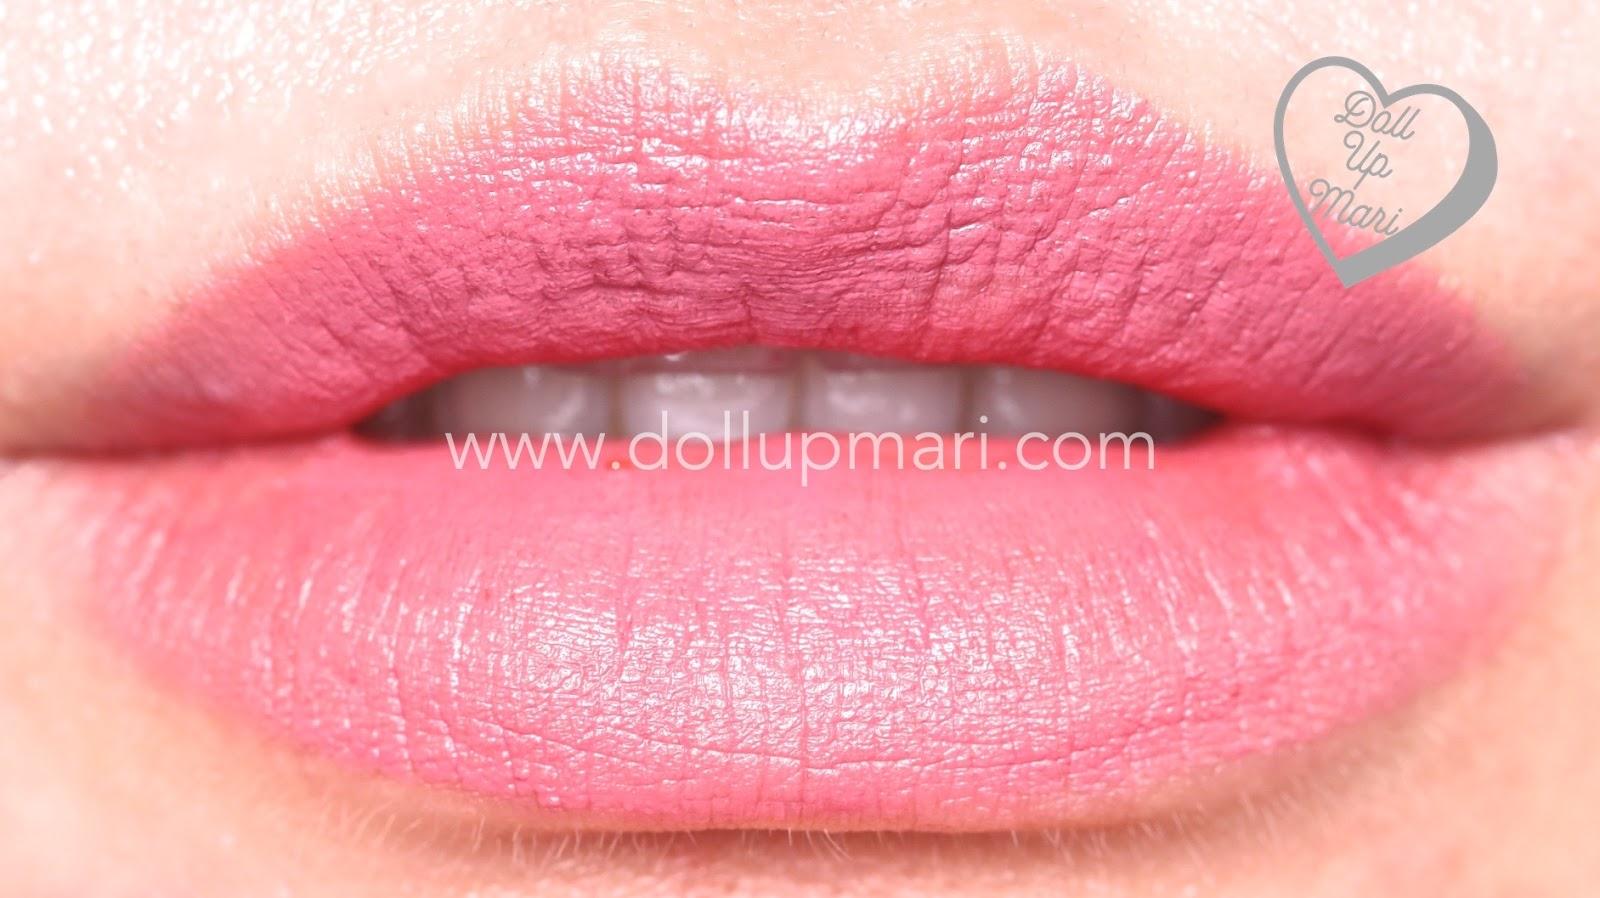 lip swatch of Pink Truffle shade of AVON Perfectly Matte Lipstick